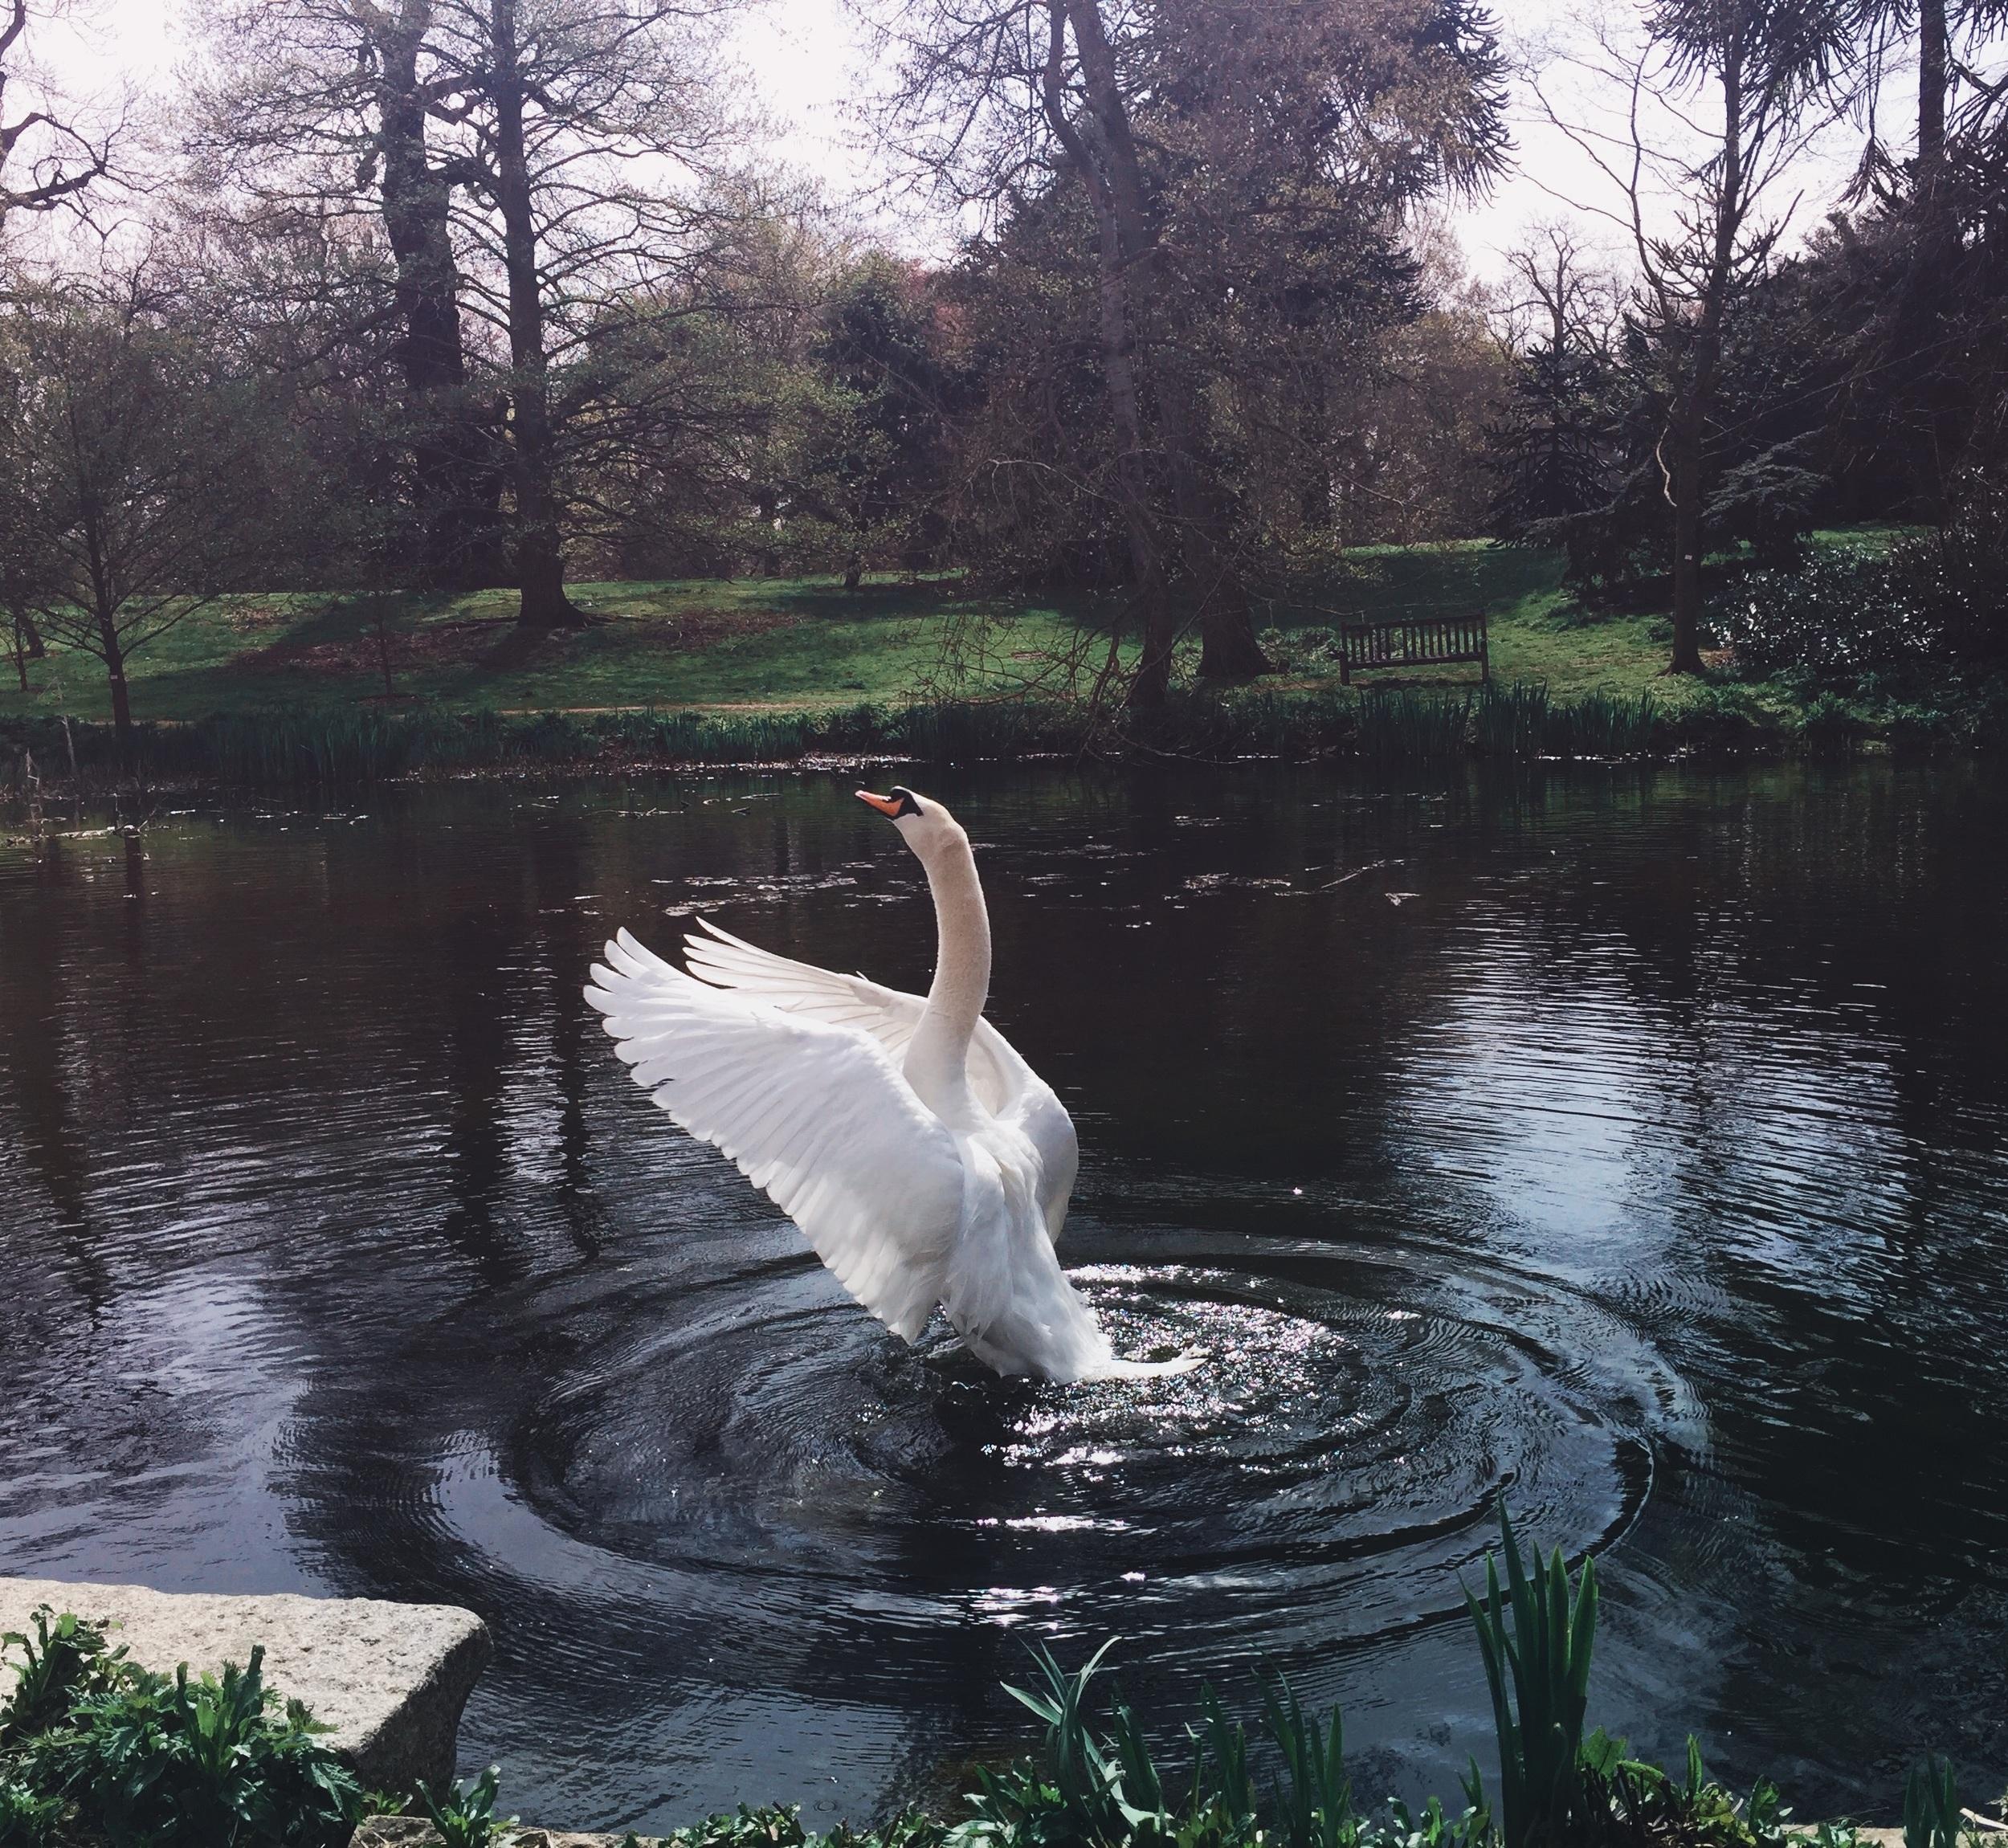 'A performance of Swan Lake'  By Tasmin